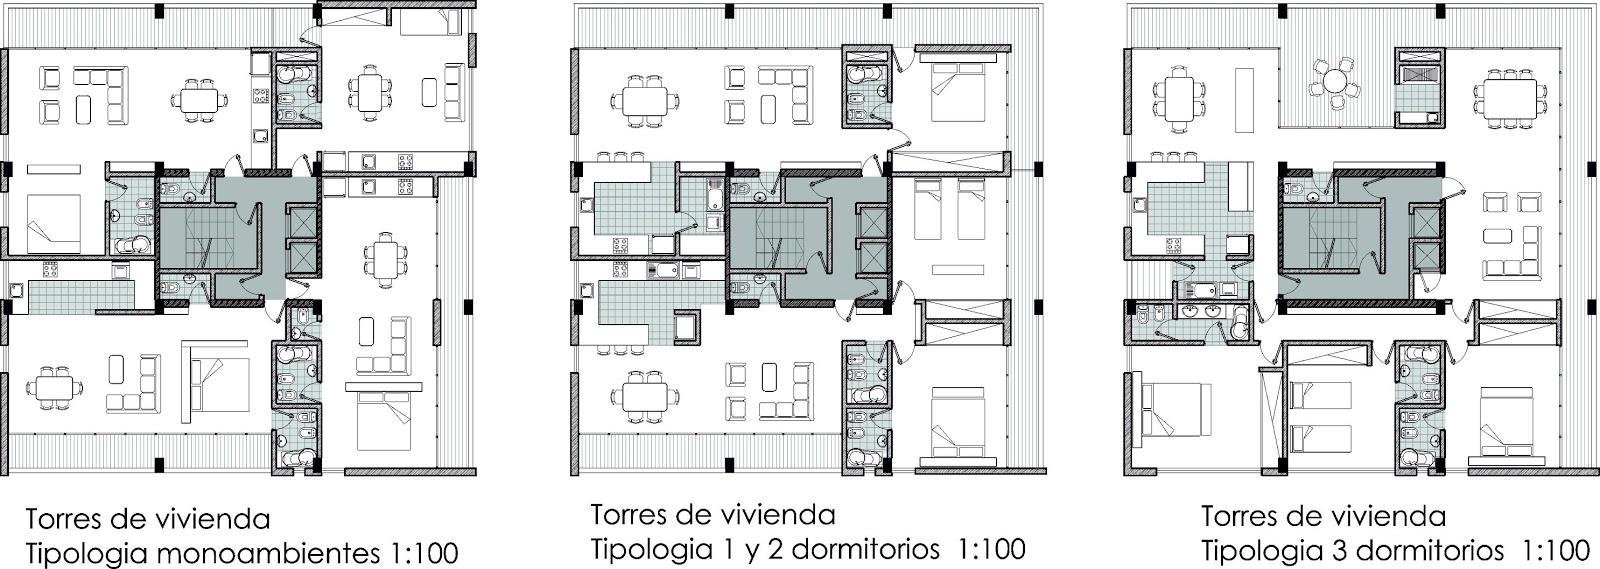 Av arquitectura abril 2013 - Plantas para dormitorio ...